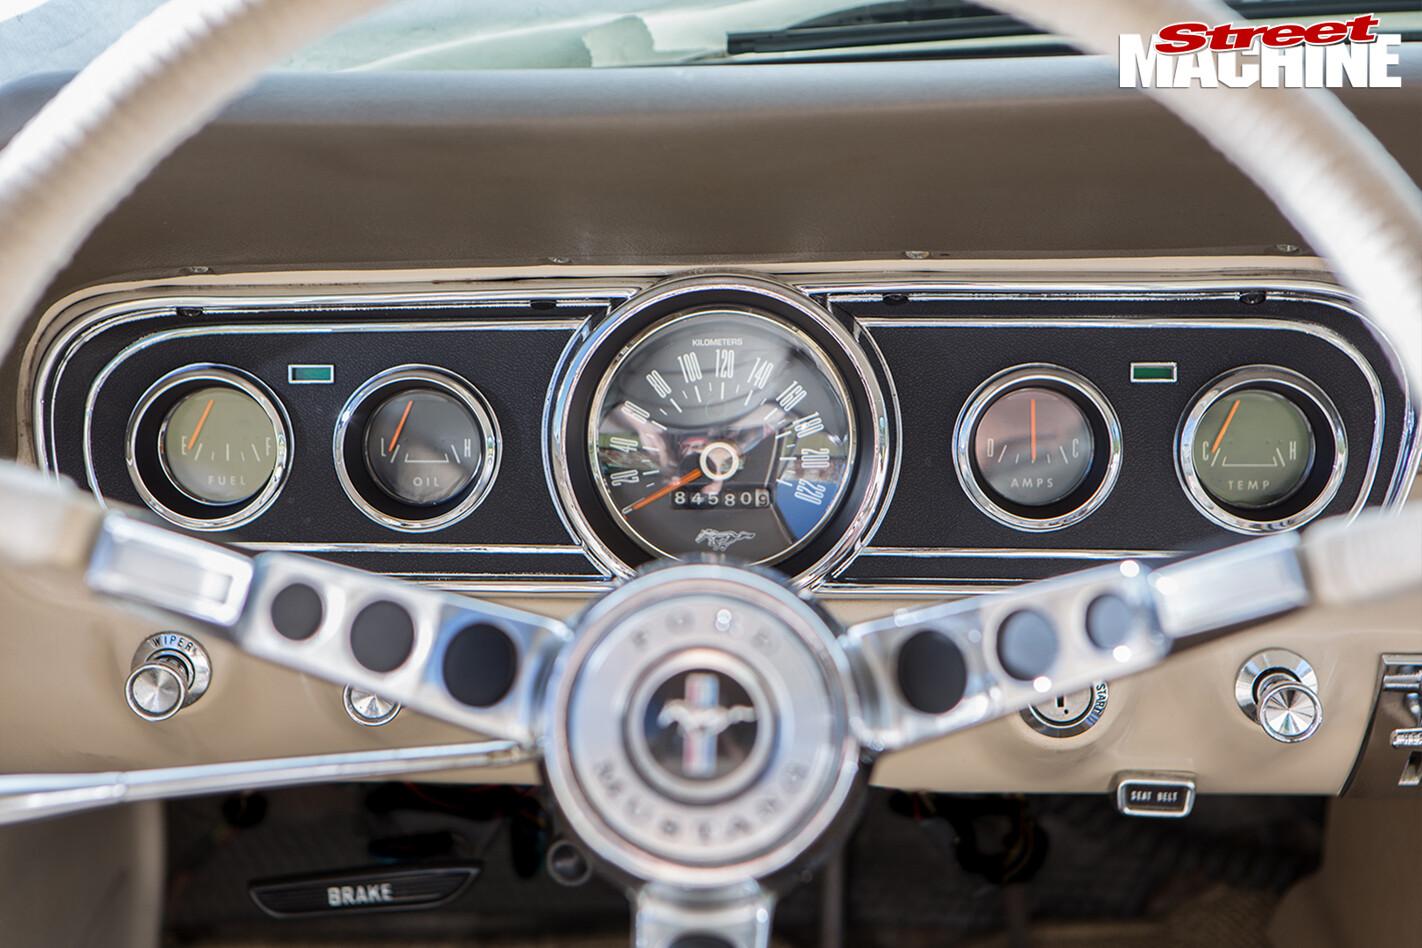 Nicole -Bridge -1966-Mustang -dash